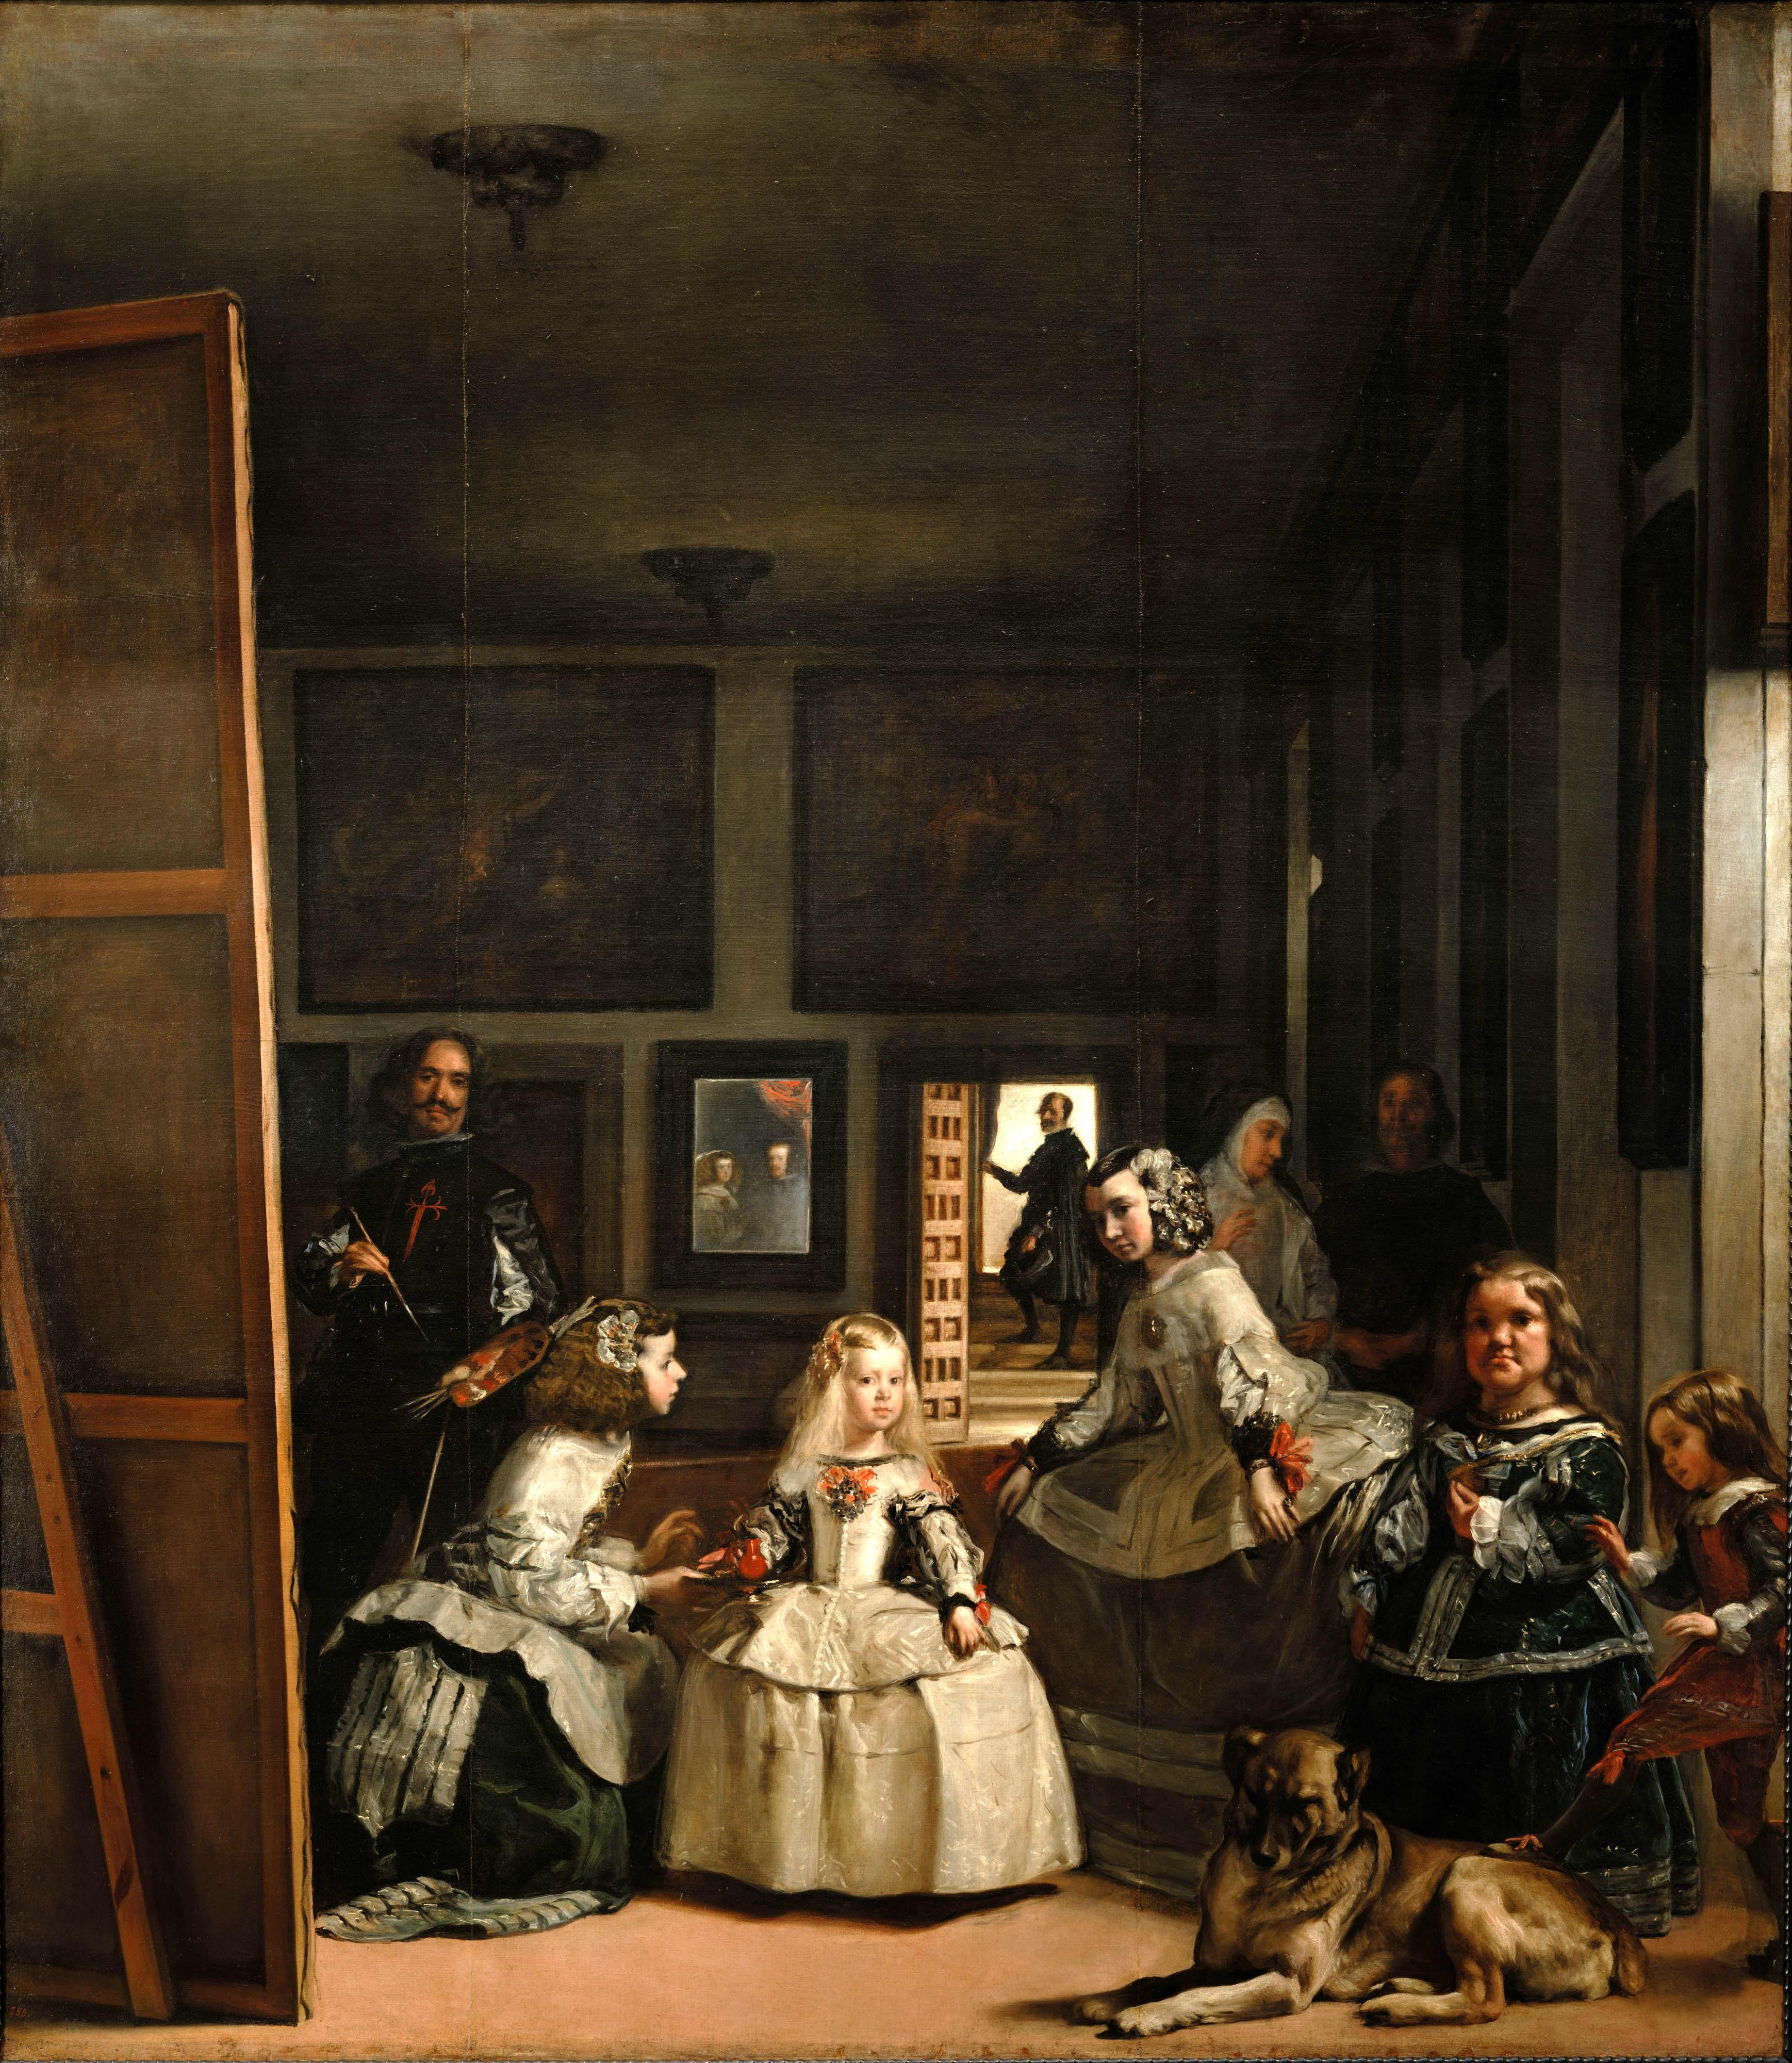 http://upload.wikimedia.org/wikipedia/commons/f/f8/Las_Meninas_(1656),_by_Velazquez.jpg